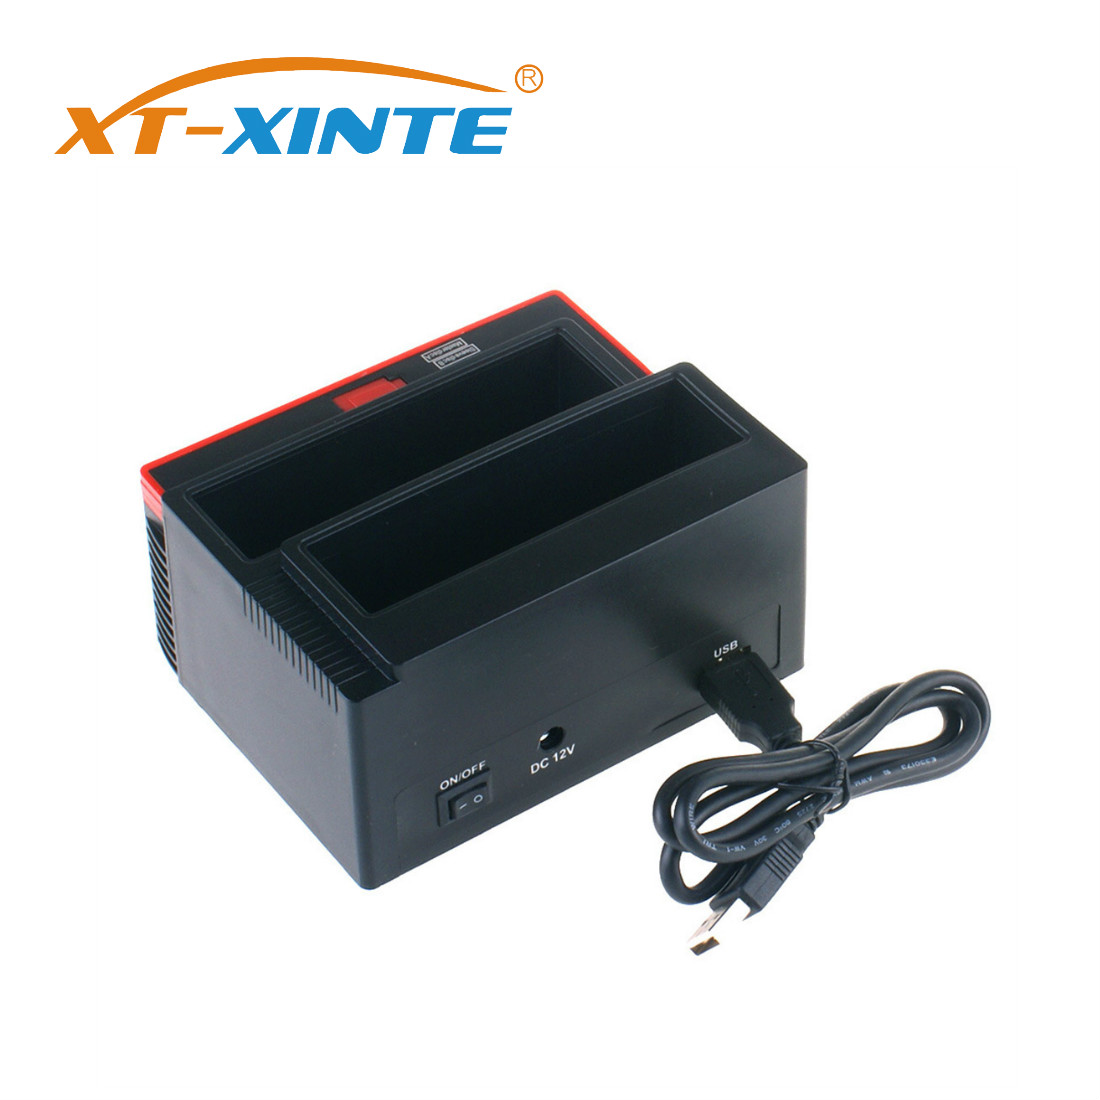 XT-XINTE SATA HDD Docking Station 2.5/3.5